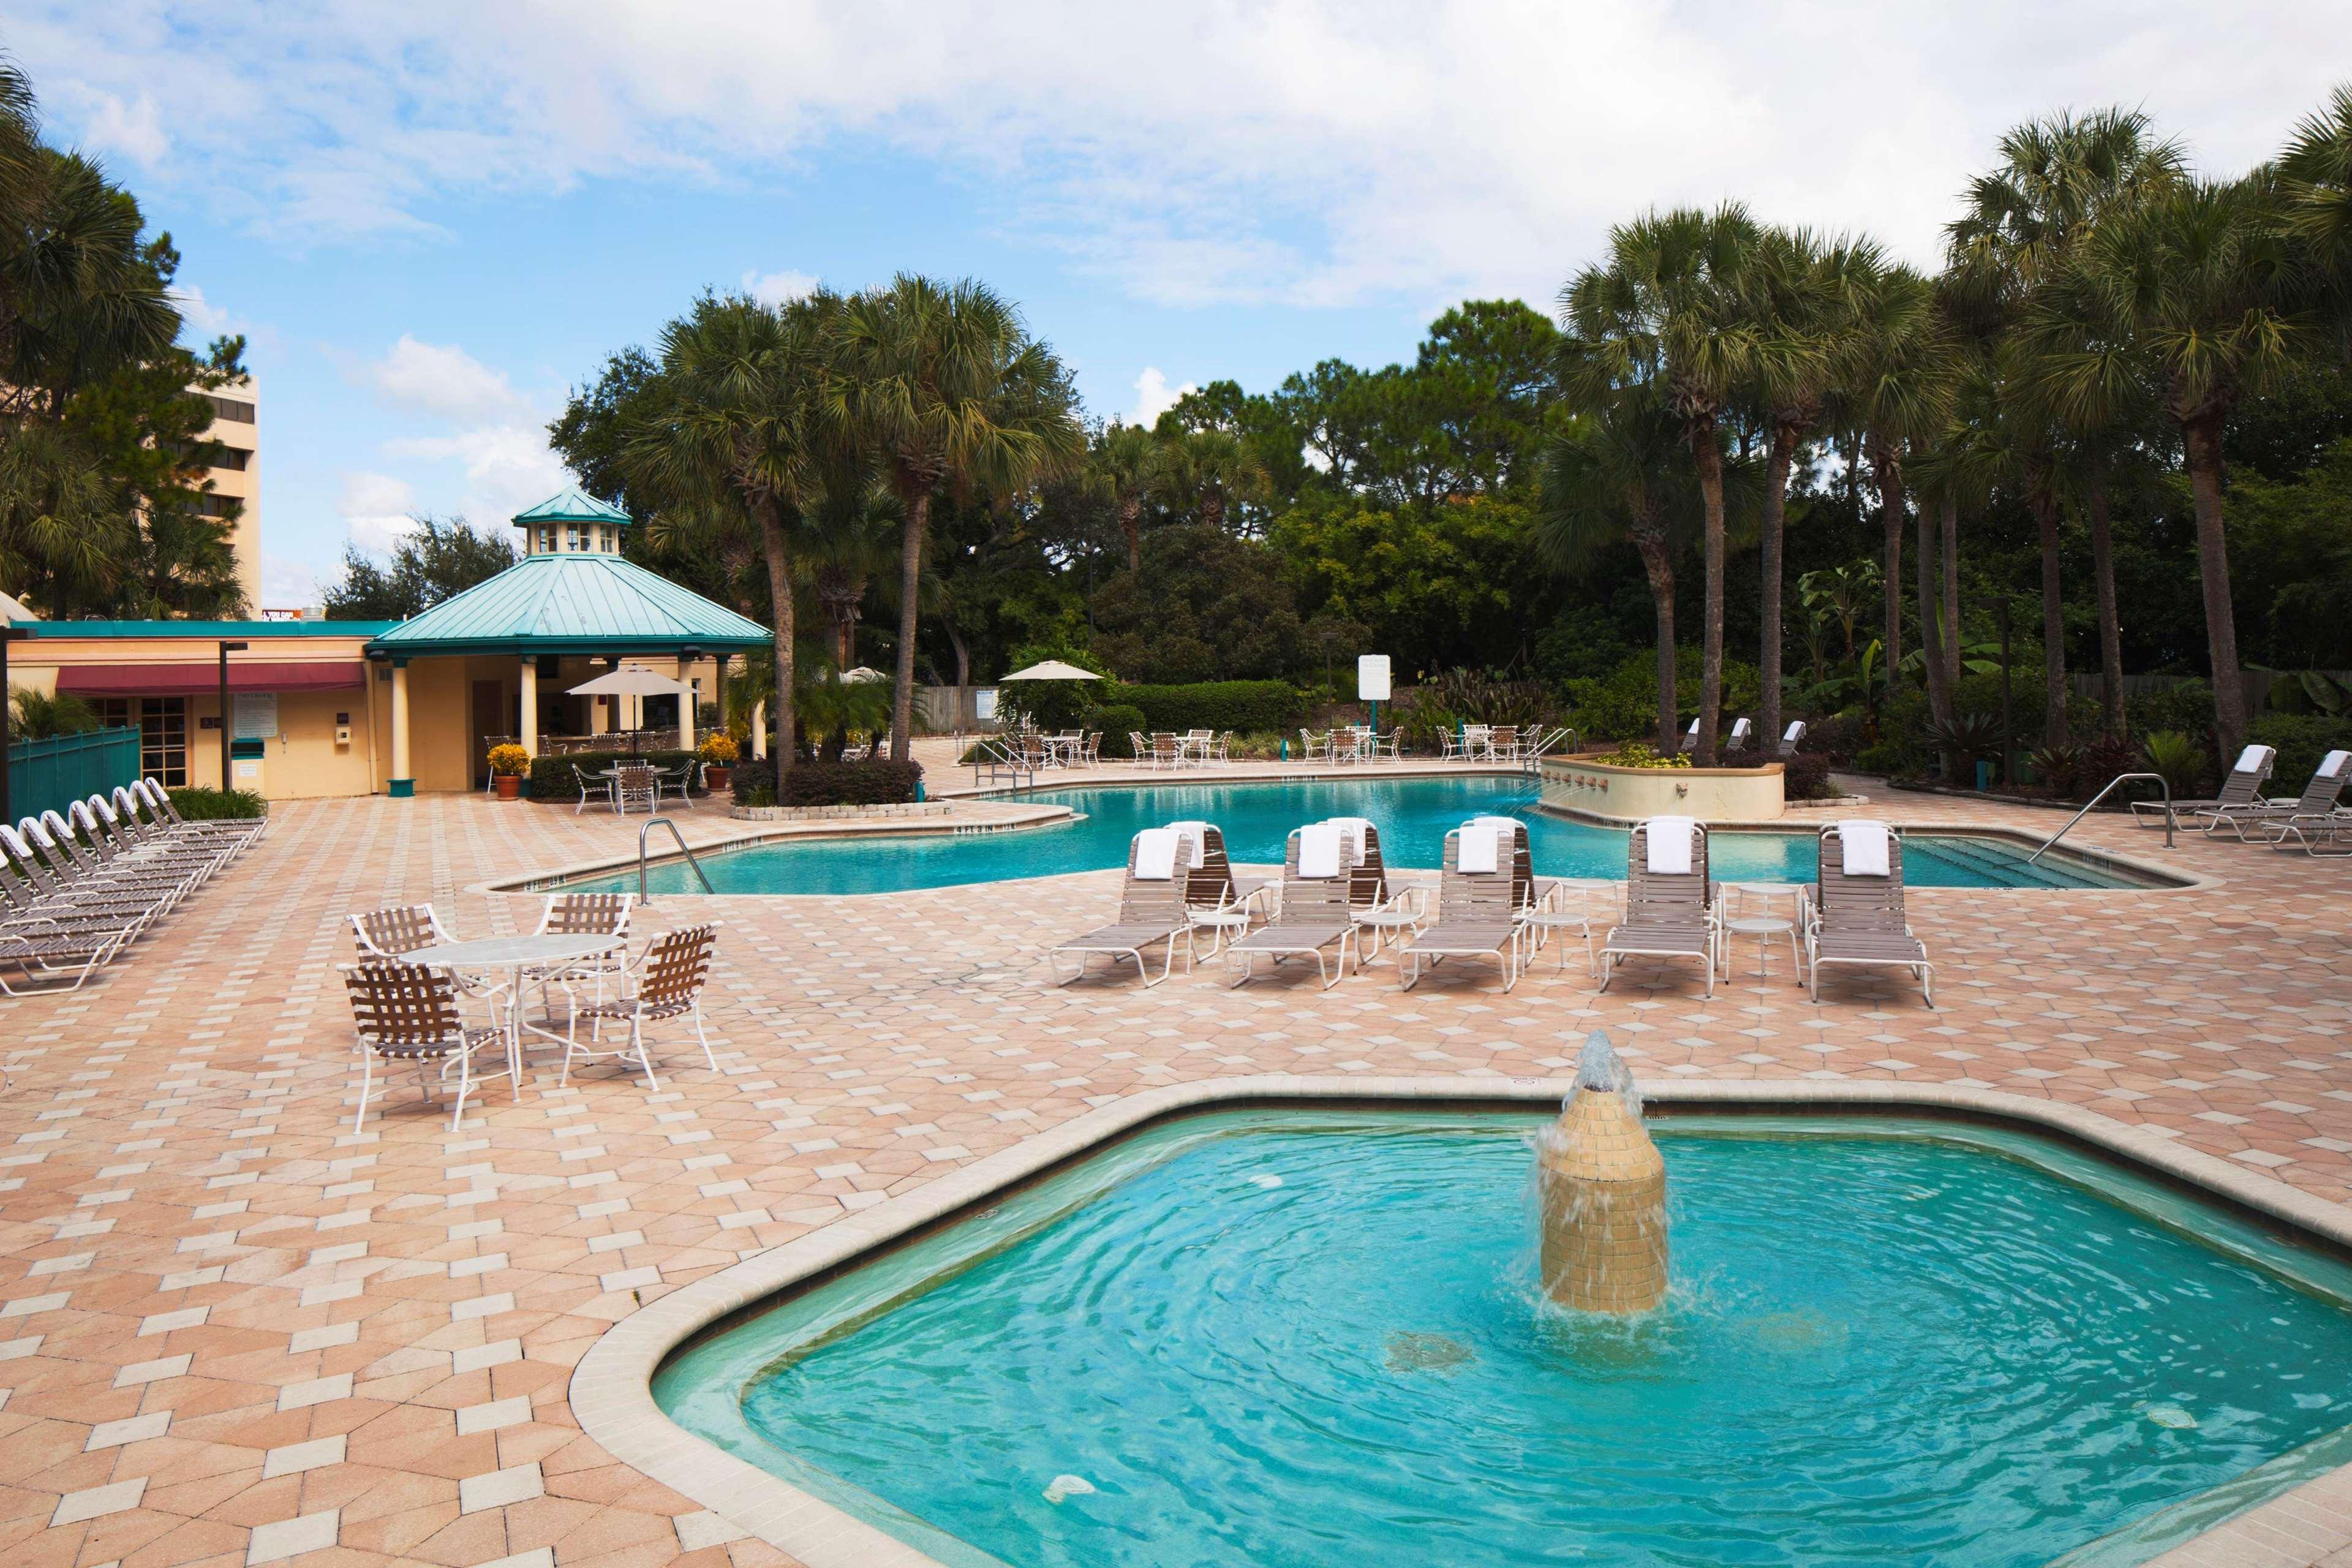 DoubleTree Suites by Hilton Orlando - Disney Springs Area image 24